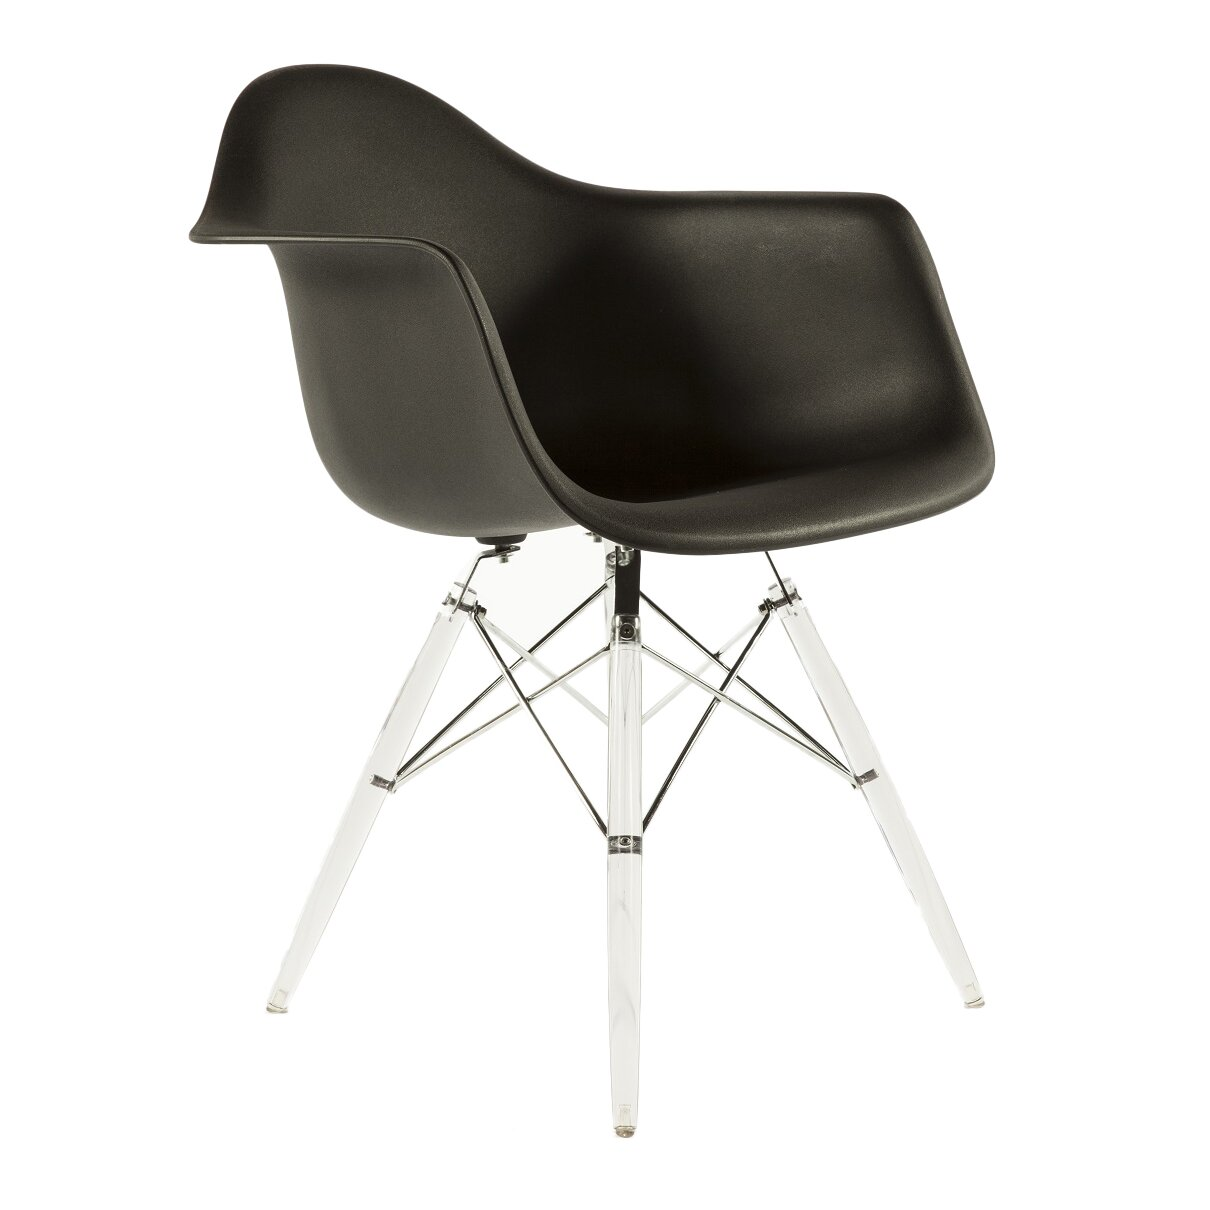 stilnovo the mid century eiffel side chair reviews wayfair. Black Bedroom Furniture Sets. Home Design Ideas